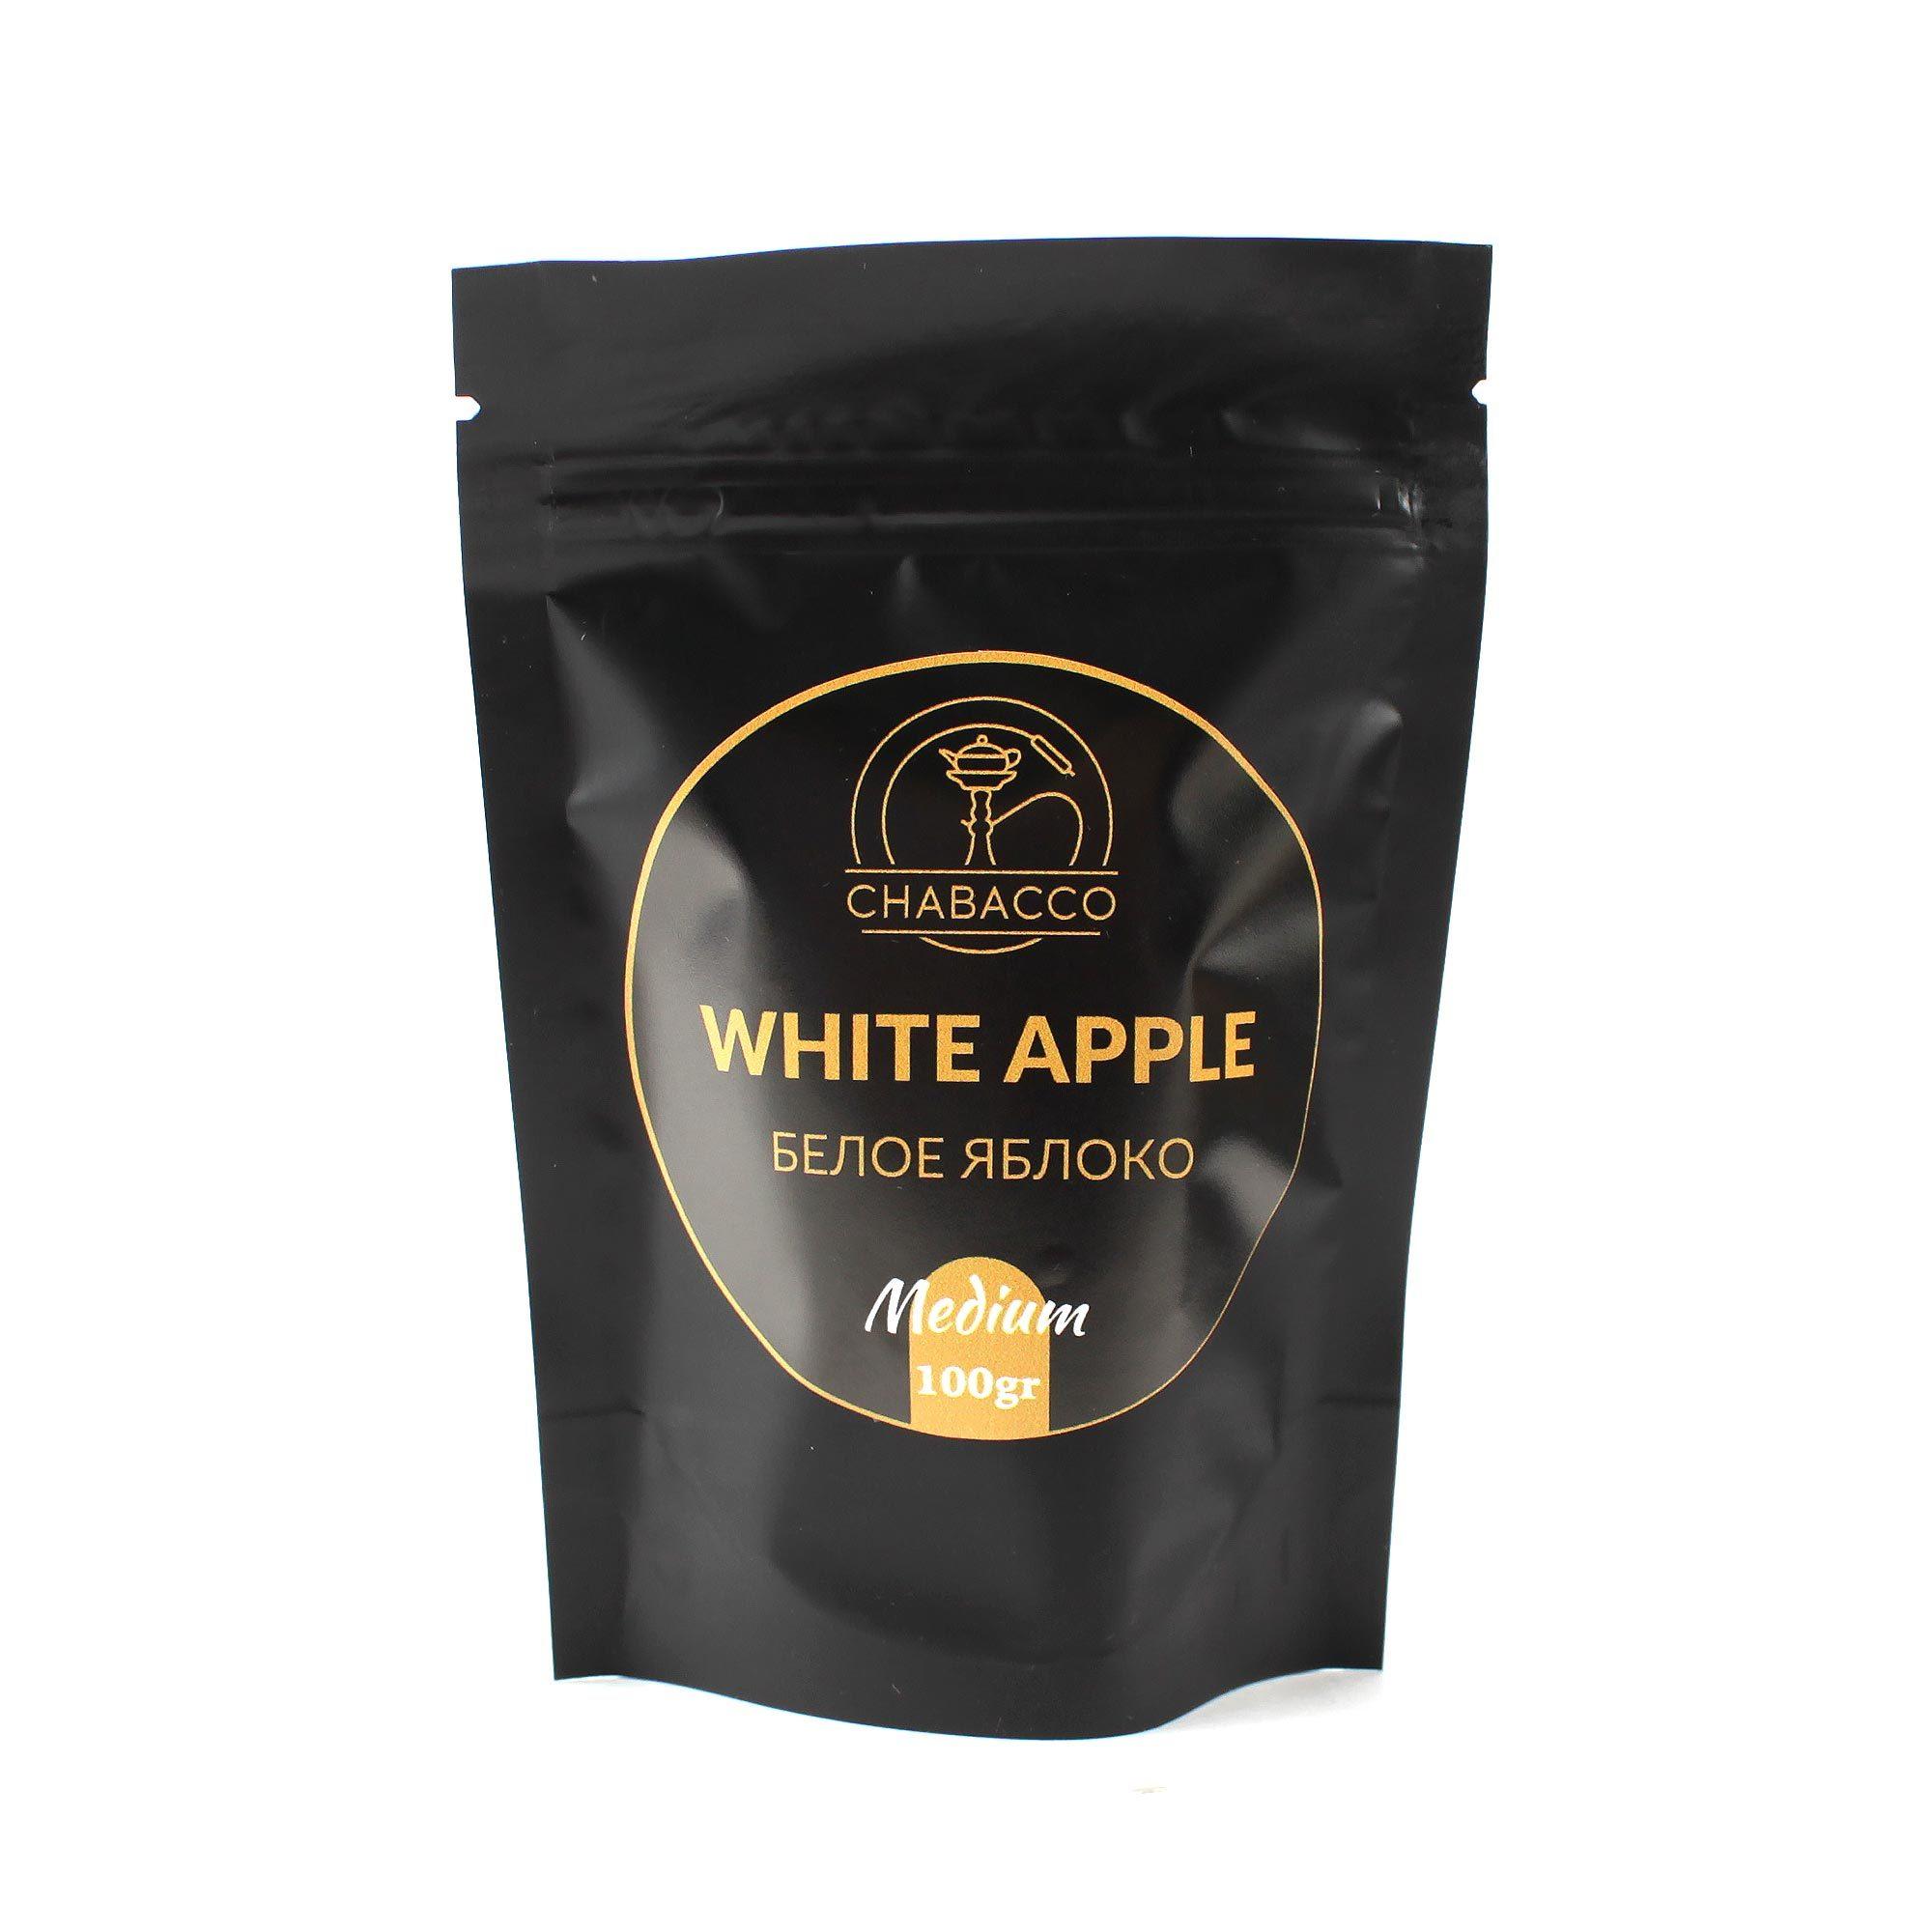 Кальянная смесь Chabacco Medium 100 гр White Apple